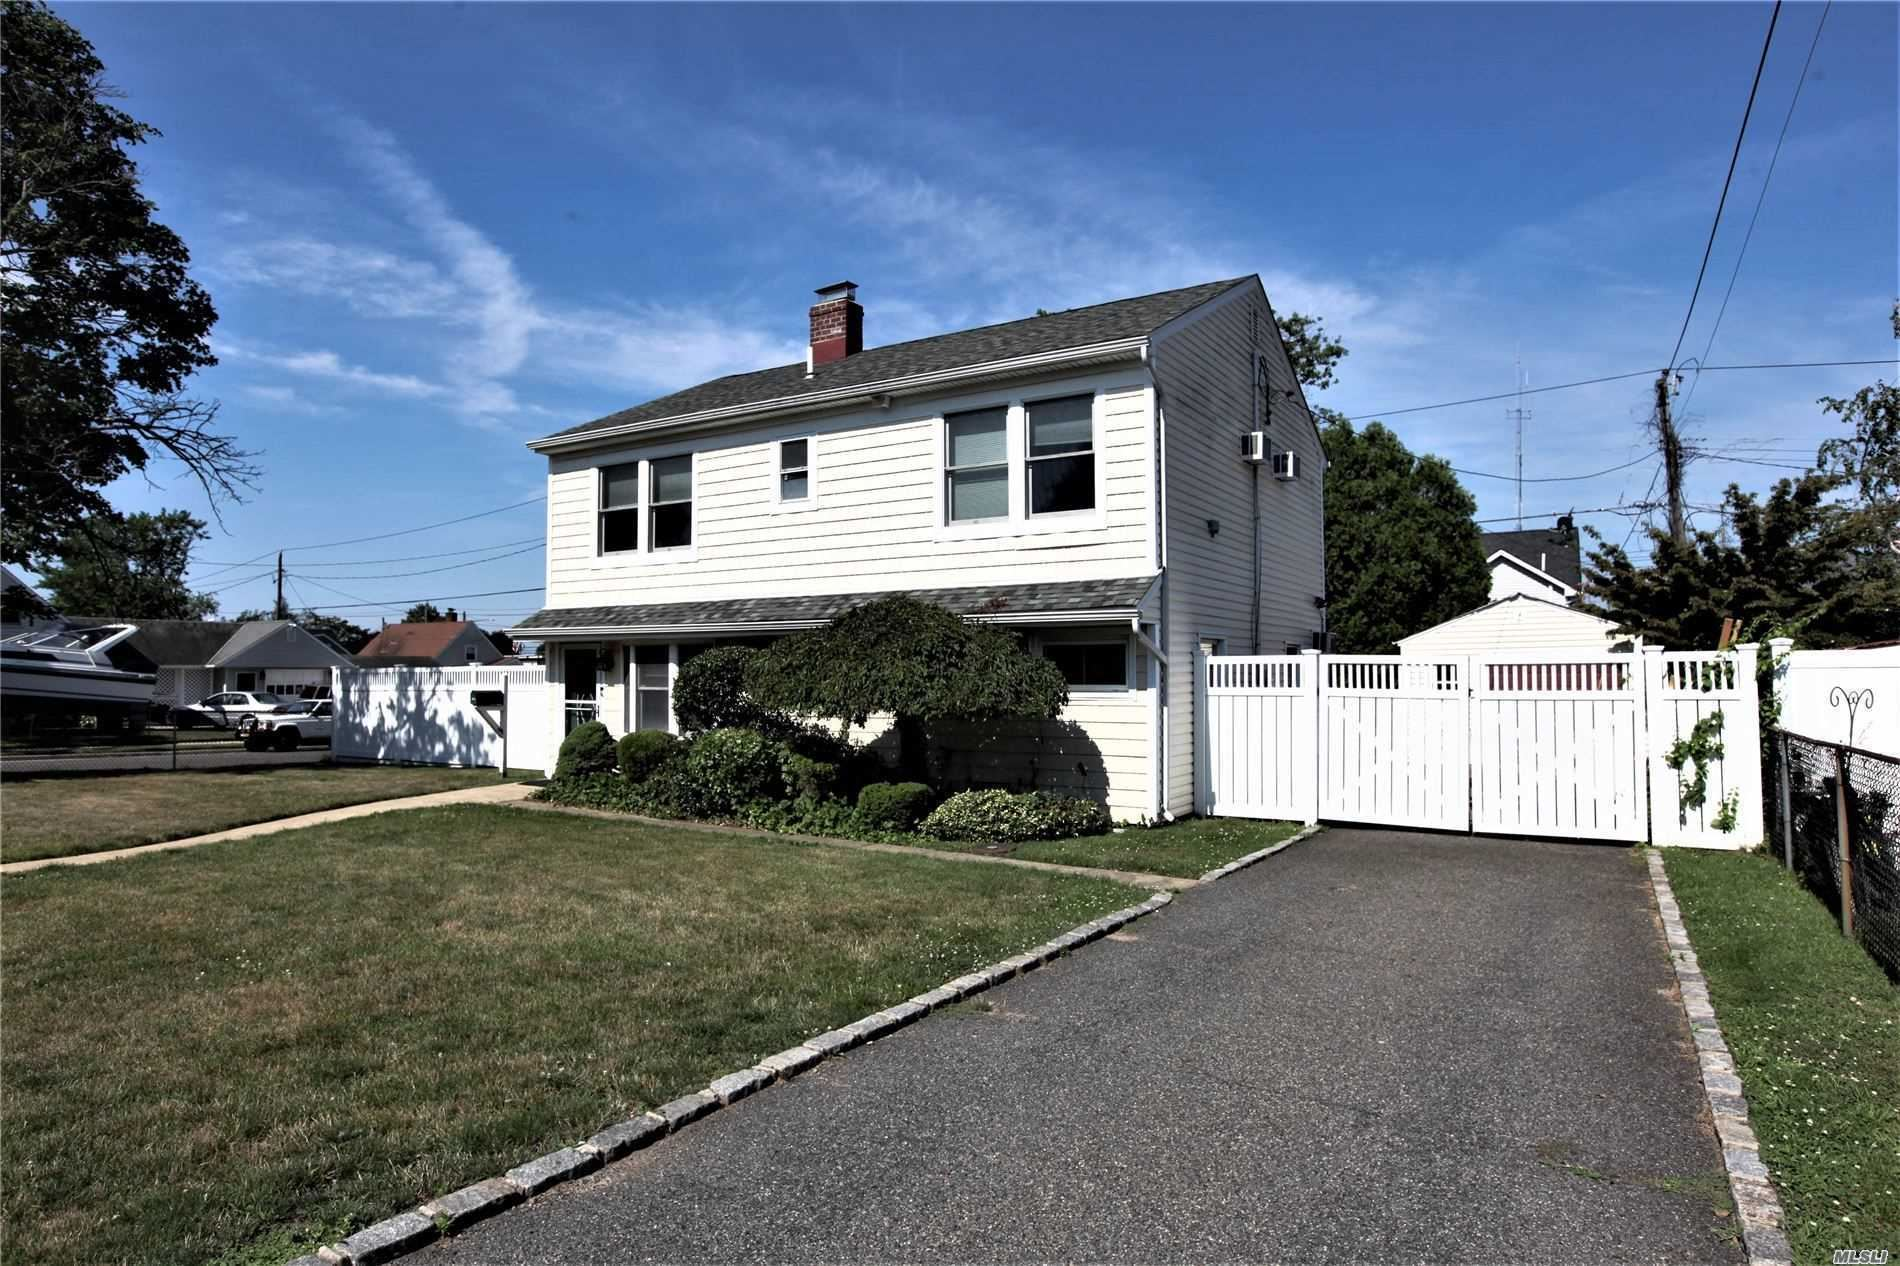 36 Abbey Lane, Levittown, NY 11756 - MLS#: 3234615